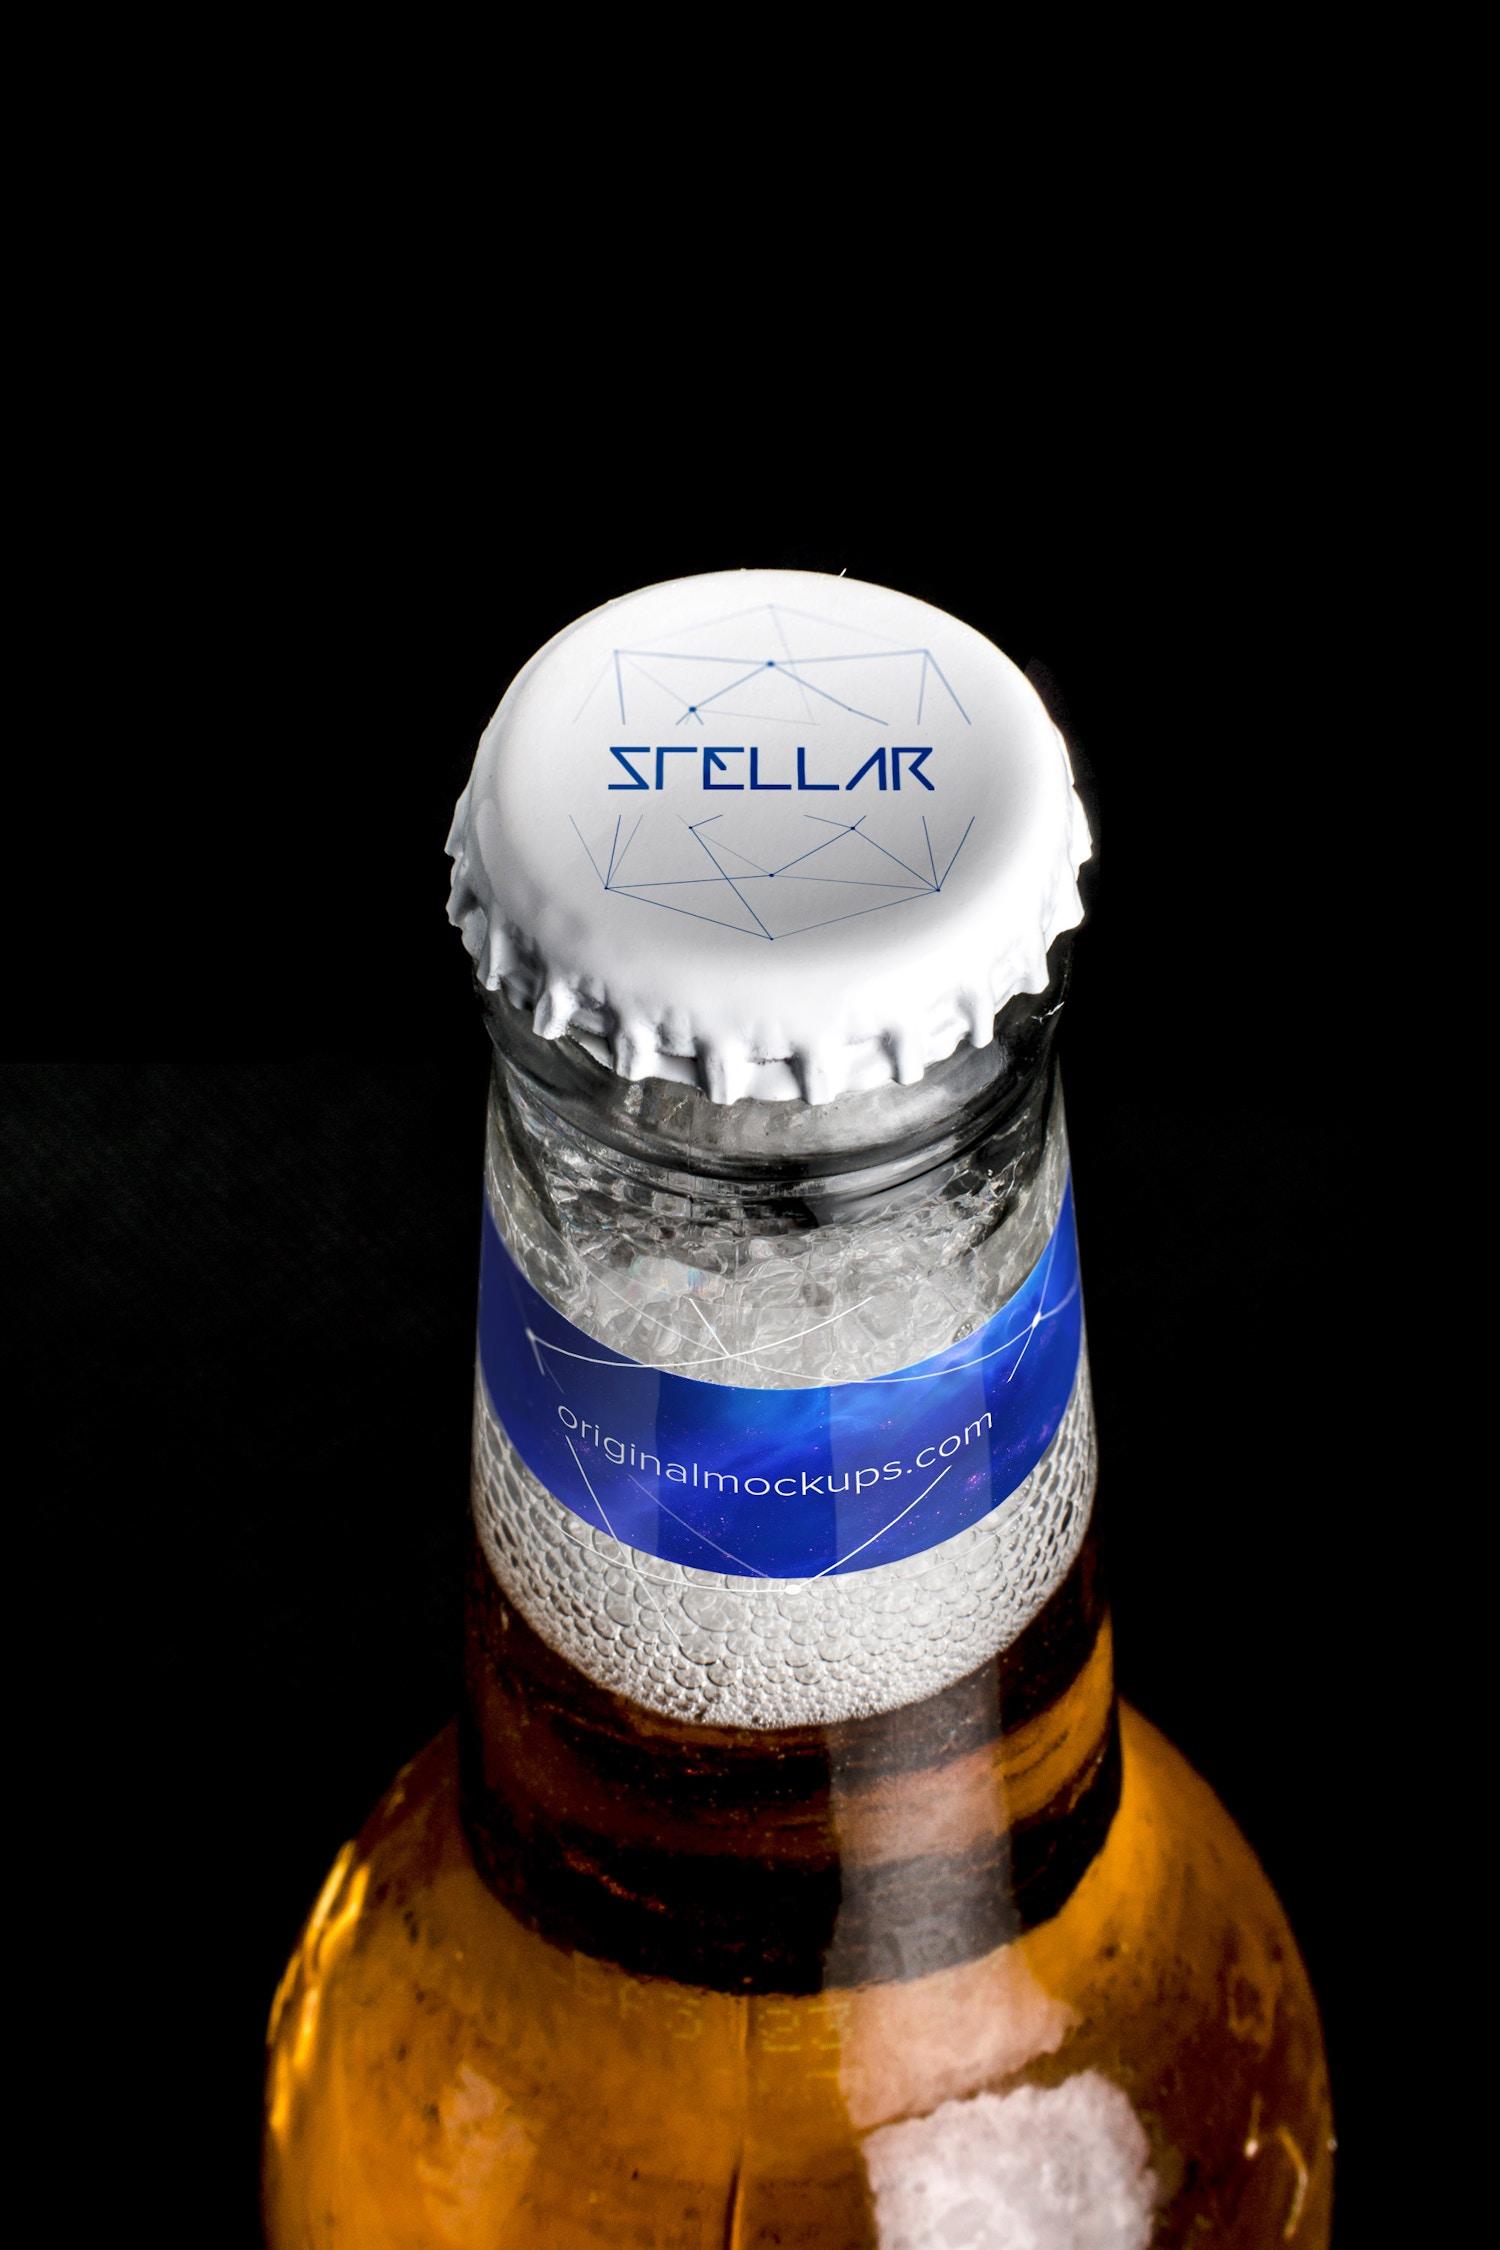 Beer Bottle Cap Mockup 01